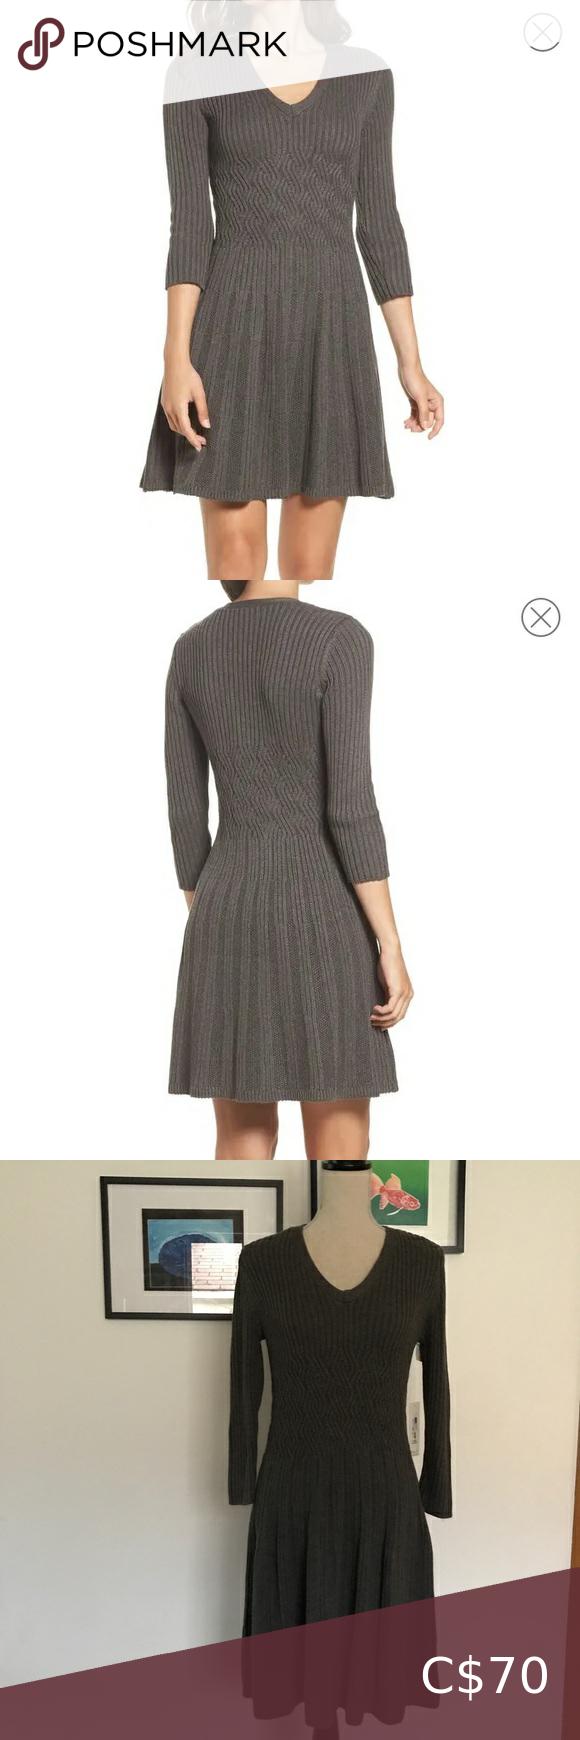 Vintage High Waist Maxi Skirts Women Long Skirt Celmia